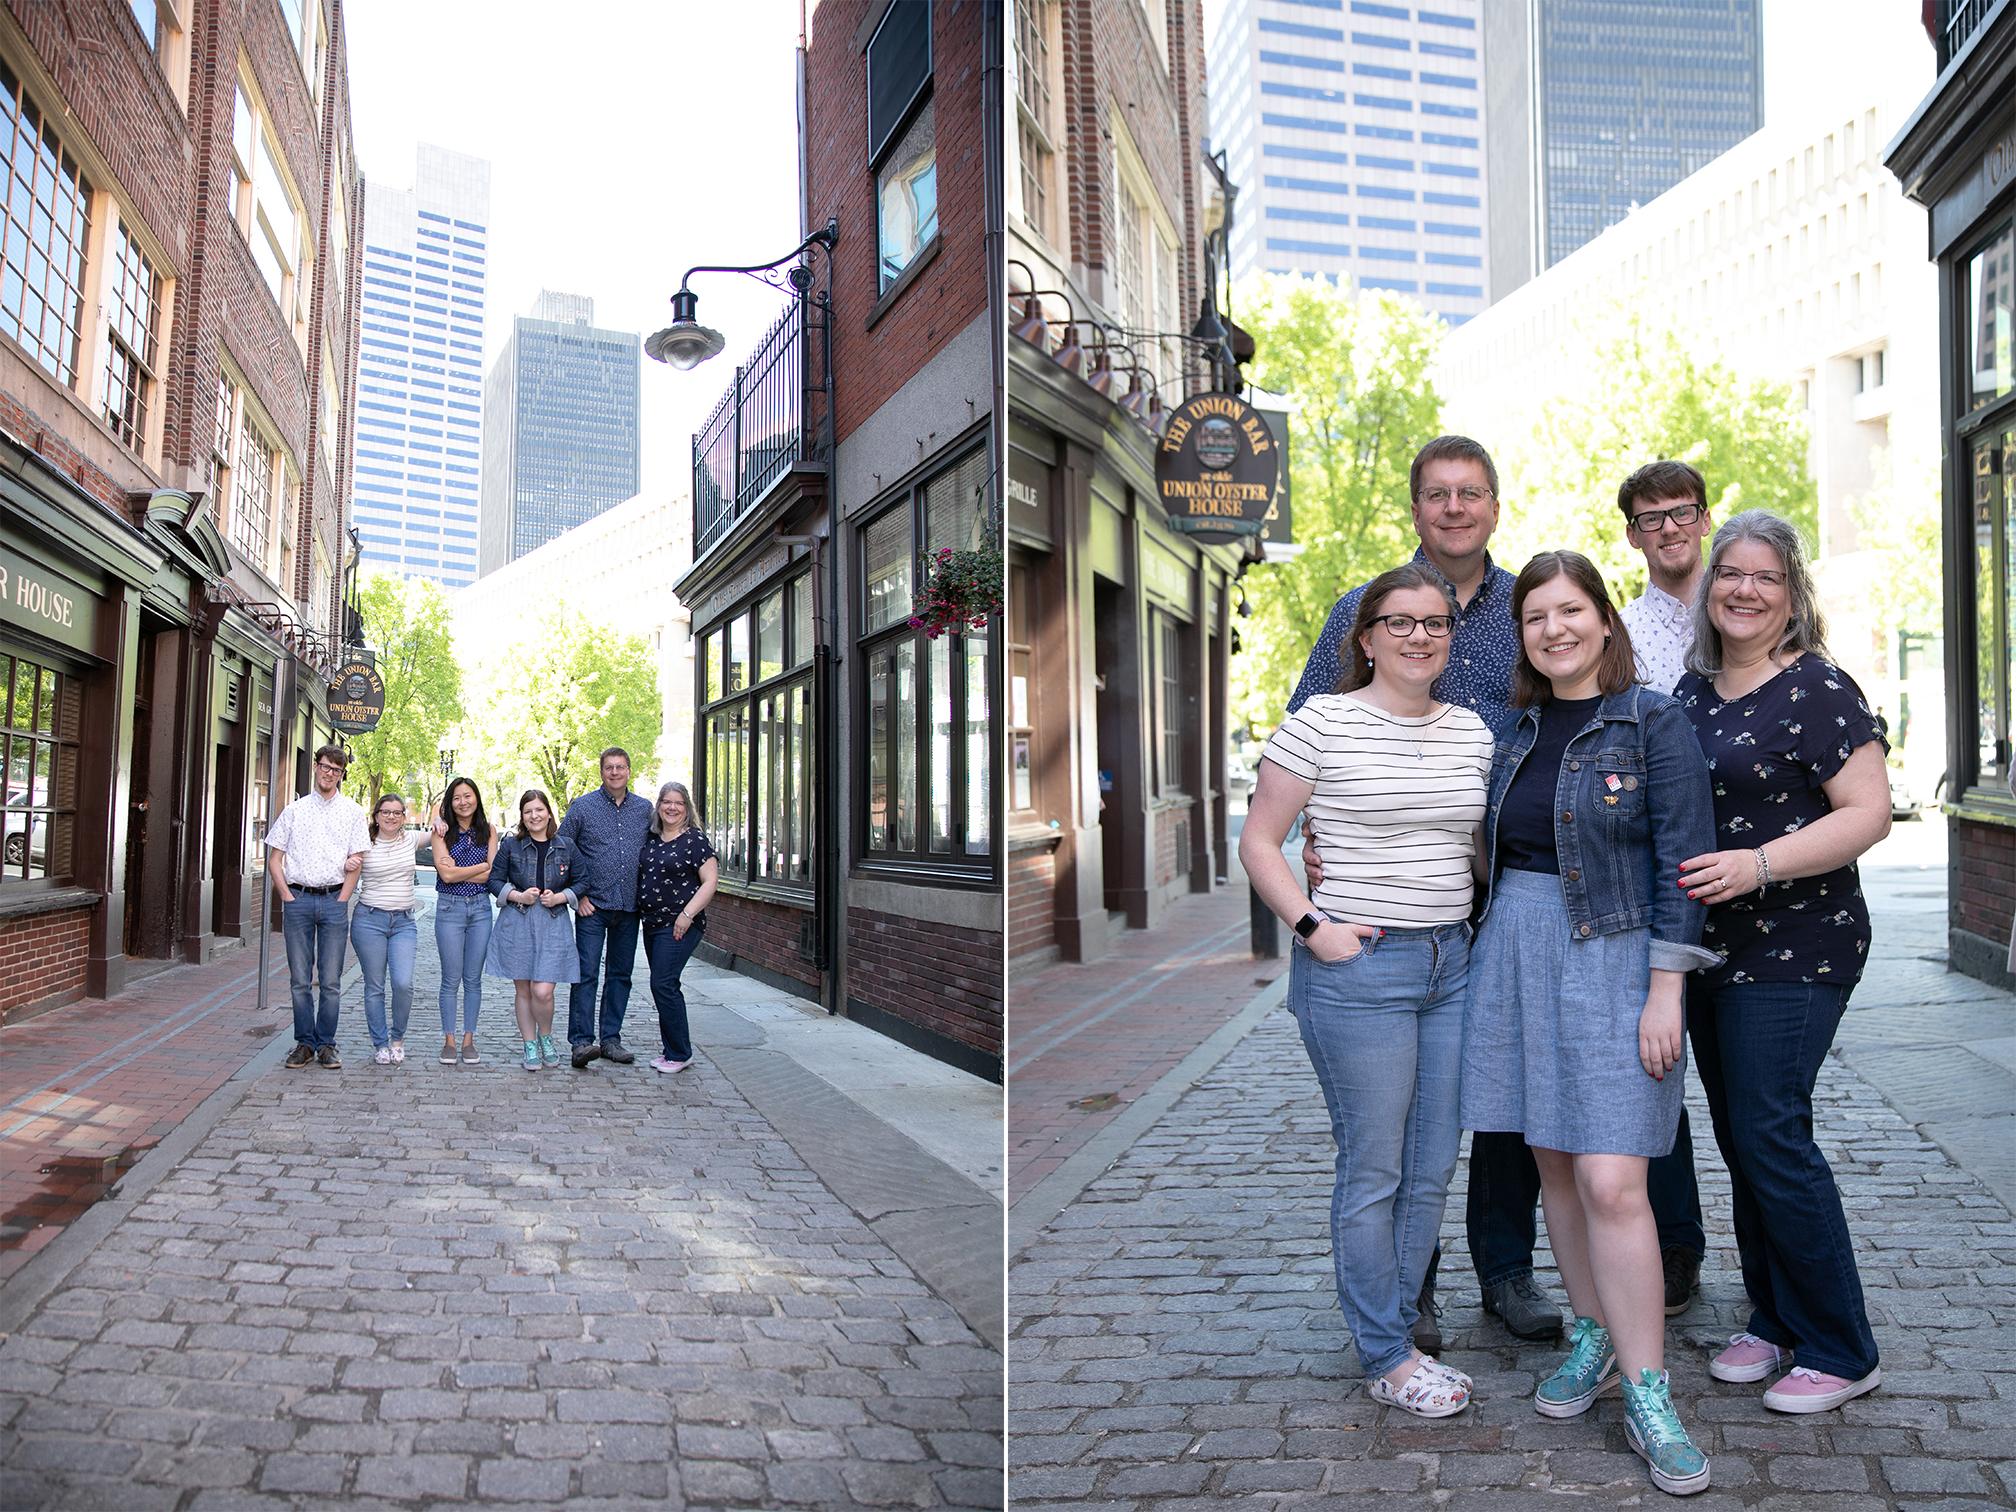 family posing in Boston alley